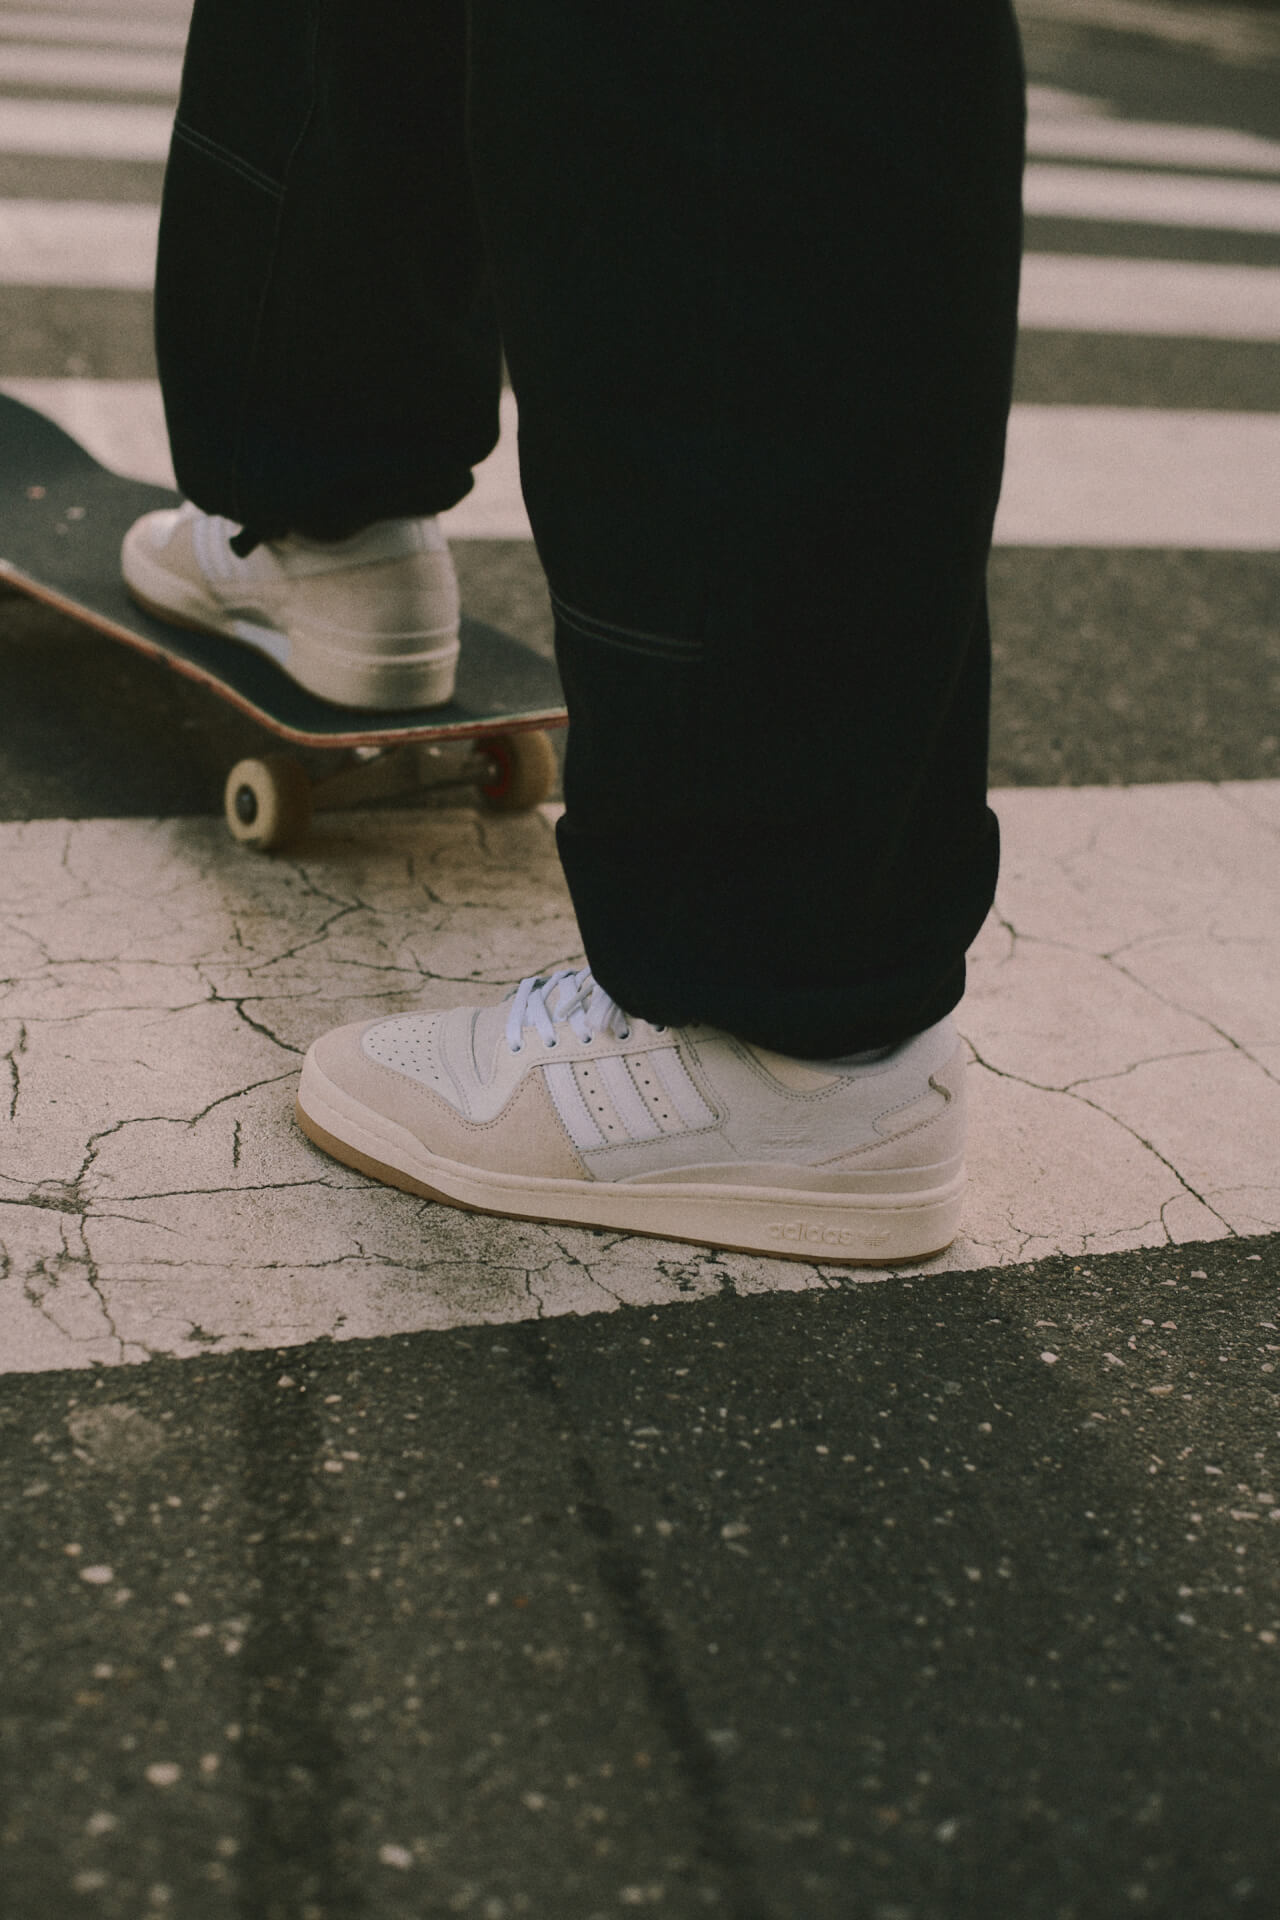 adidas Skateboarding「FORUM 84 ADV」に春夏仕様の新色が登場!チョークホワイト&ブラックの2色 life210324_adidasskateboarding_8